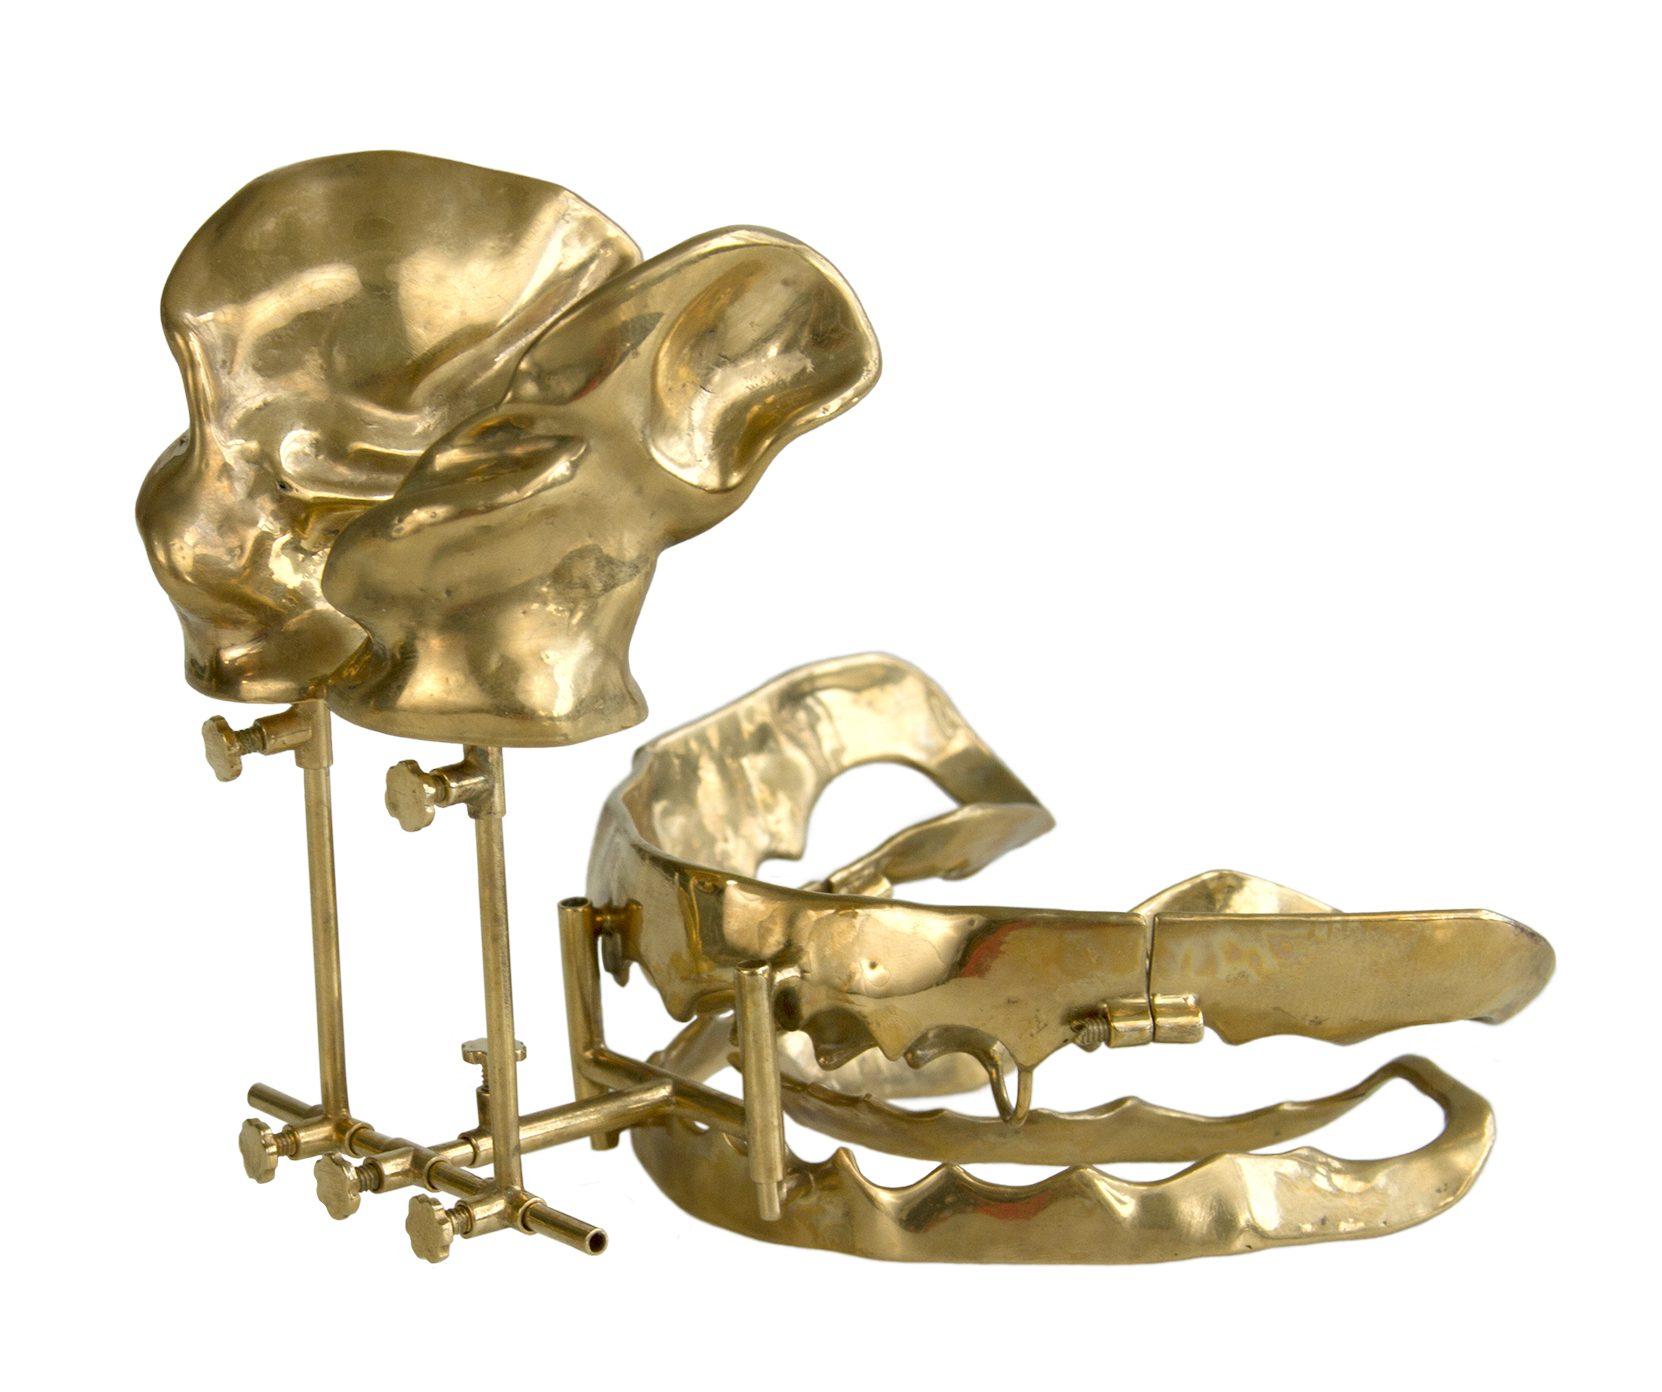 Lauren Kalman, Device for Filling a Void (1), 2014, koper, zilver, goud